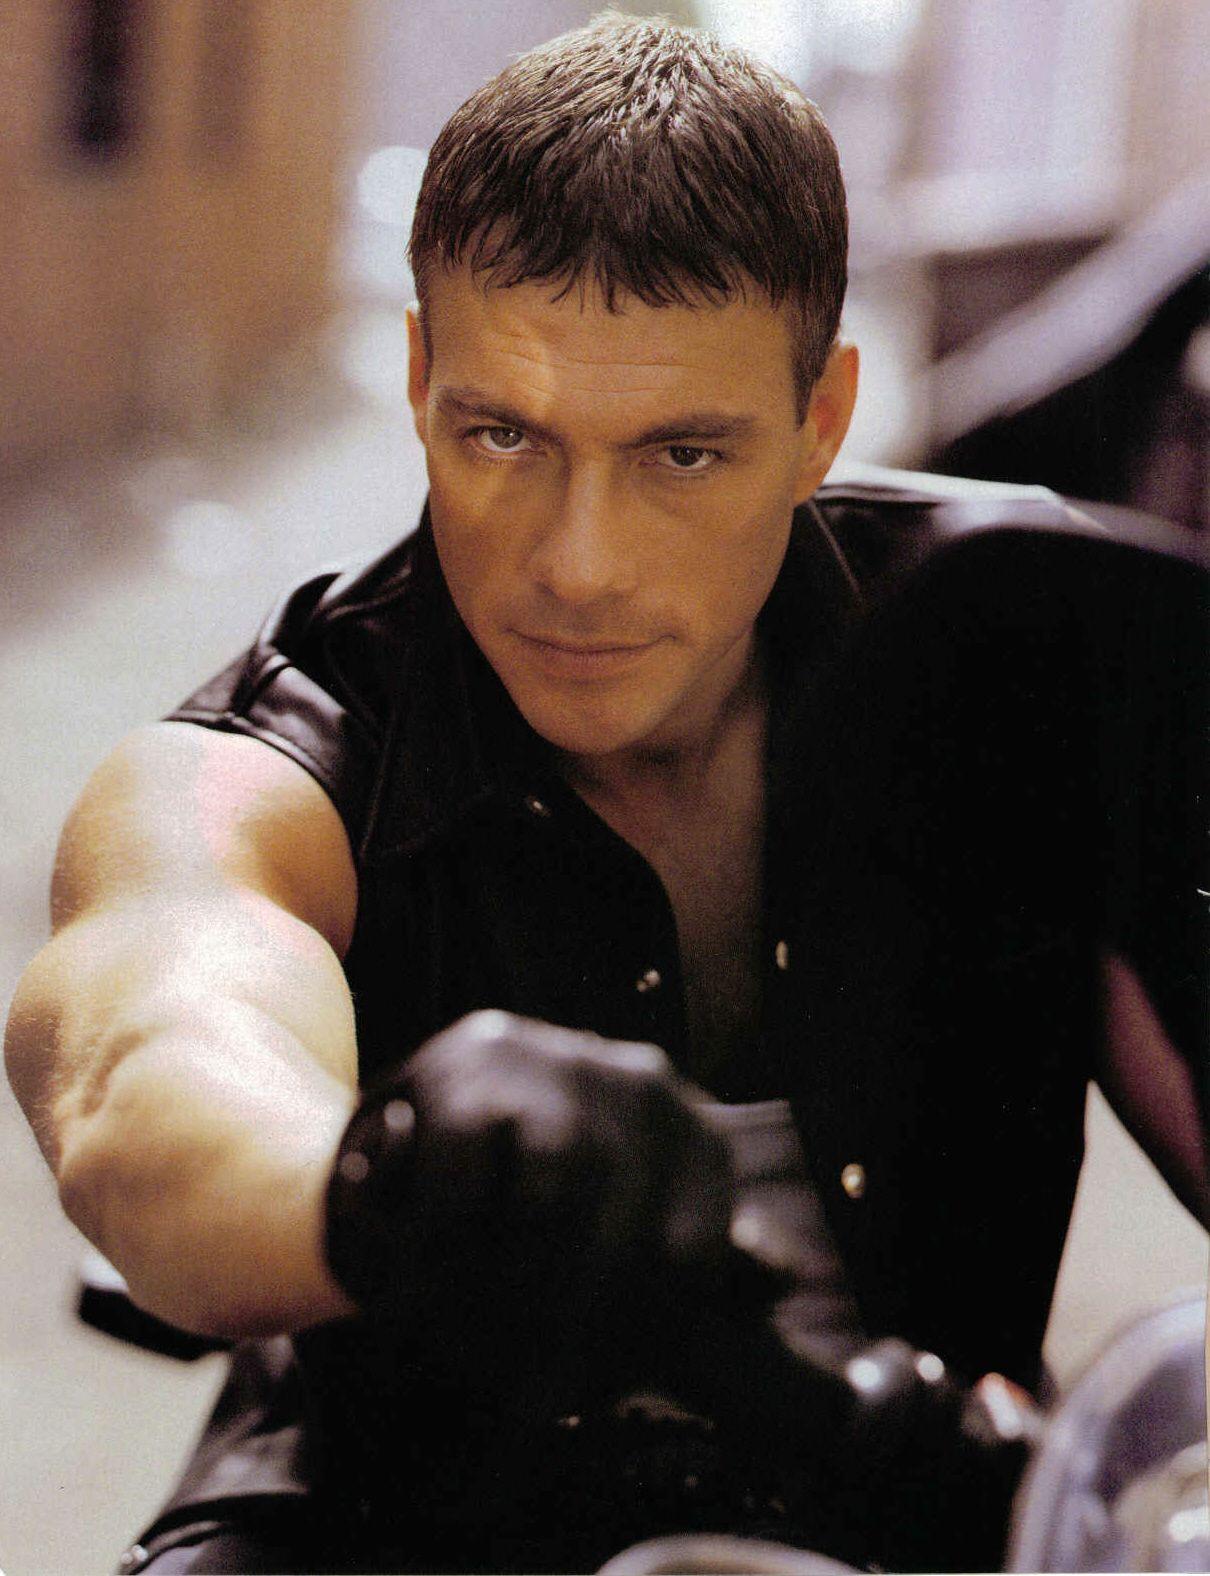 Pin De Pavol Supinsky Em Jean Claude Van Damme Ator Kickboxing Marcial